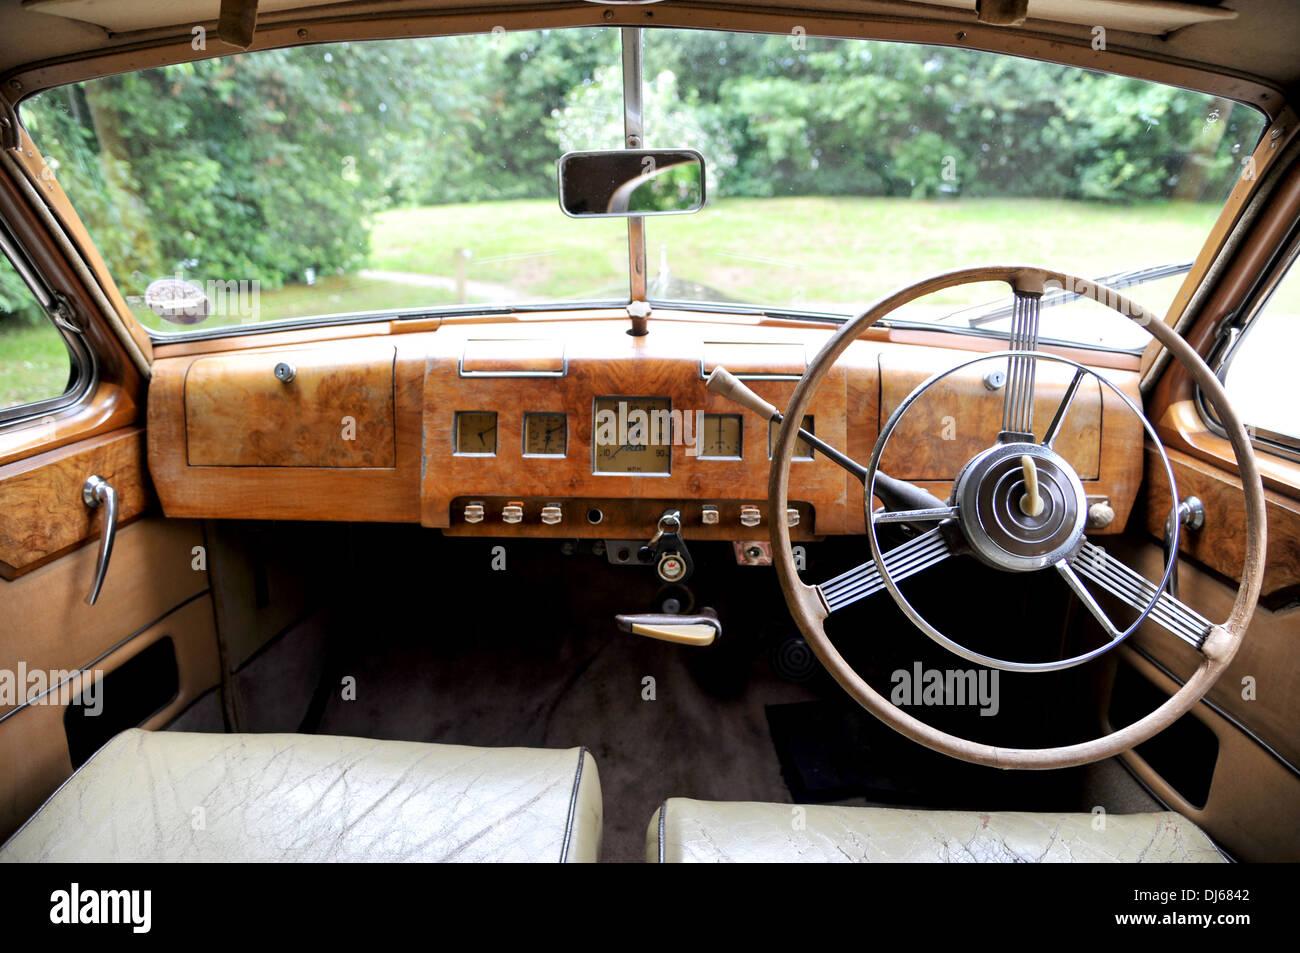 1953 Austin Sheerline Classic British Luxury Car Stock